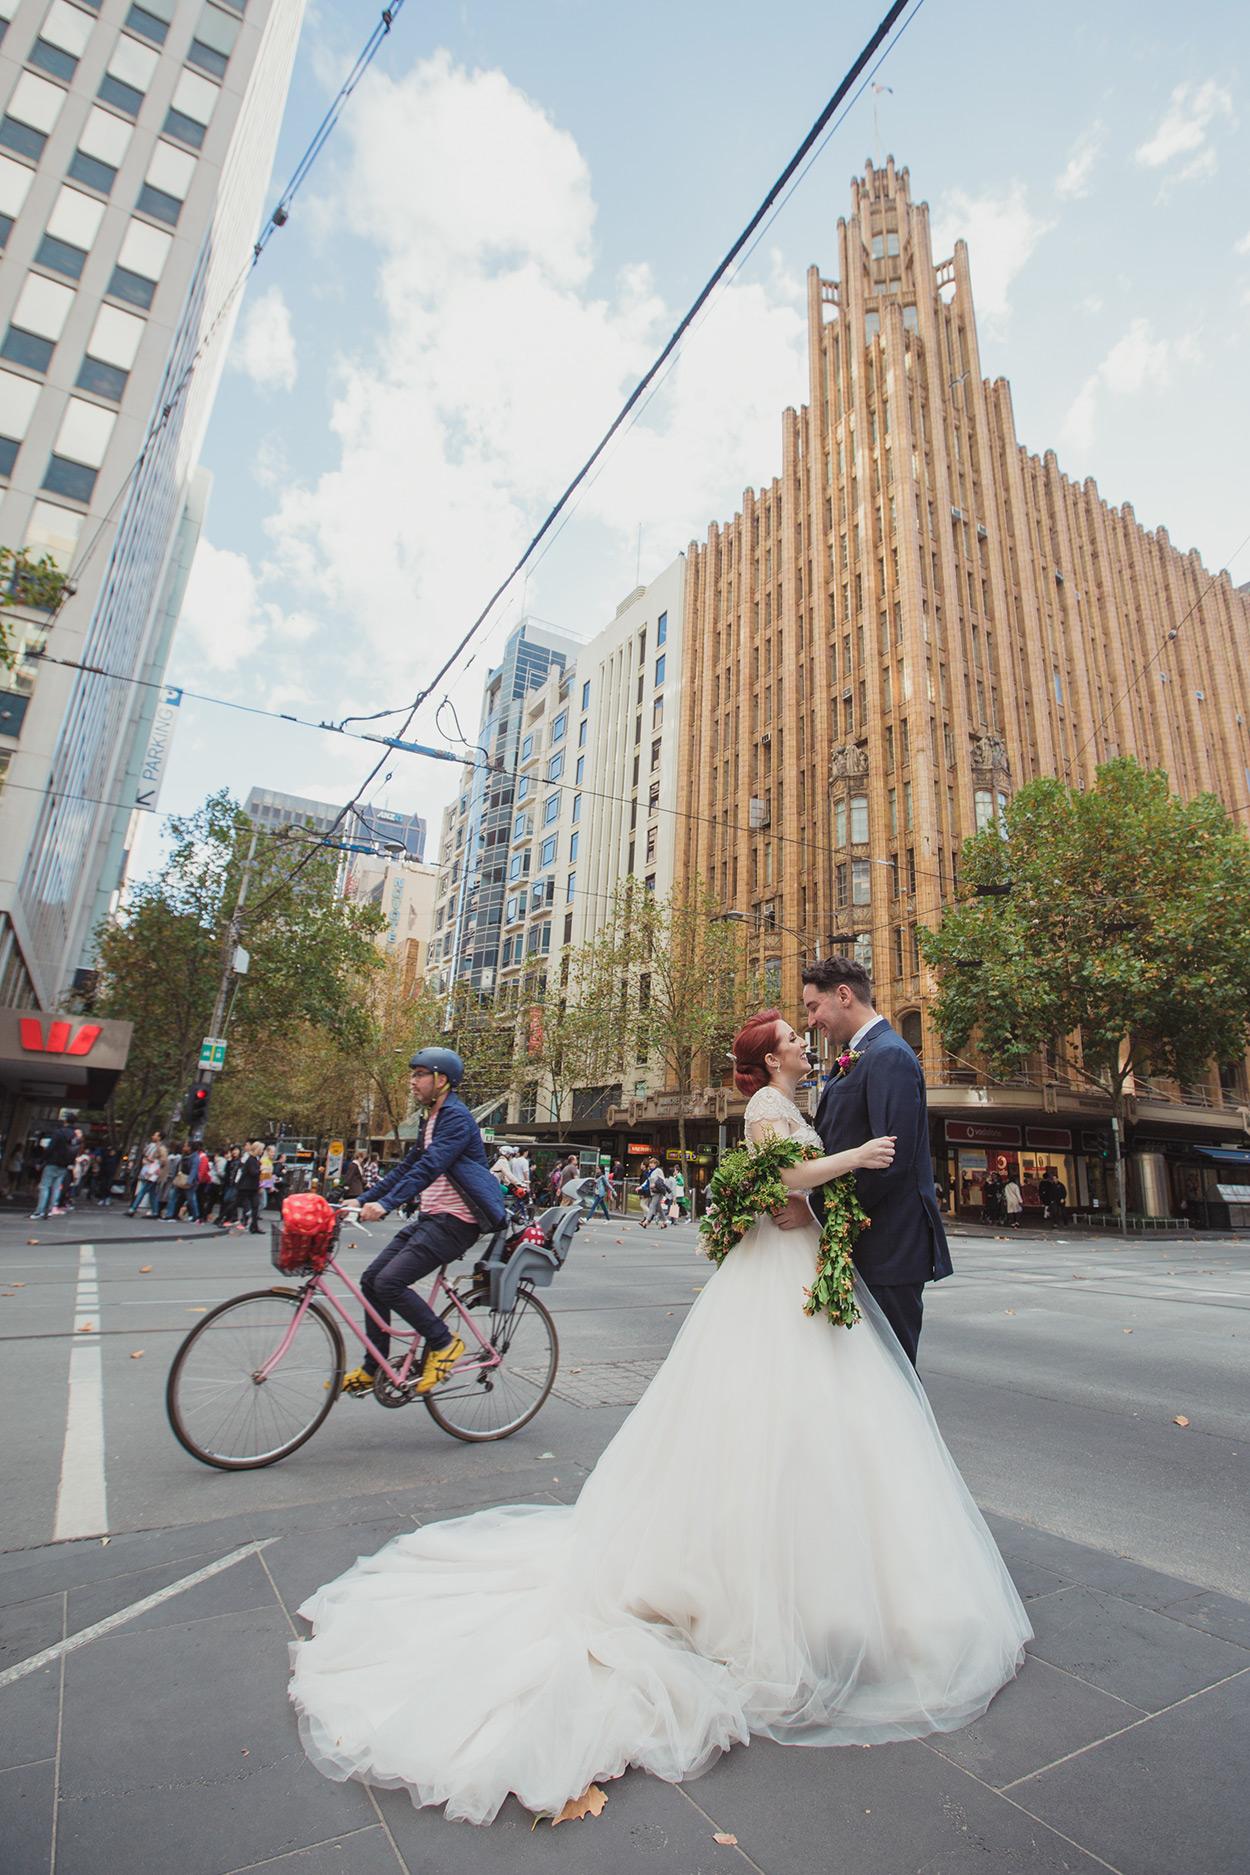 Noosa & Melbourne Pre Wedding Destination Photographer, City Portraits - Sunshine Coast, Queensland, Australian Blog